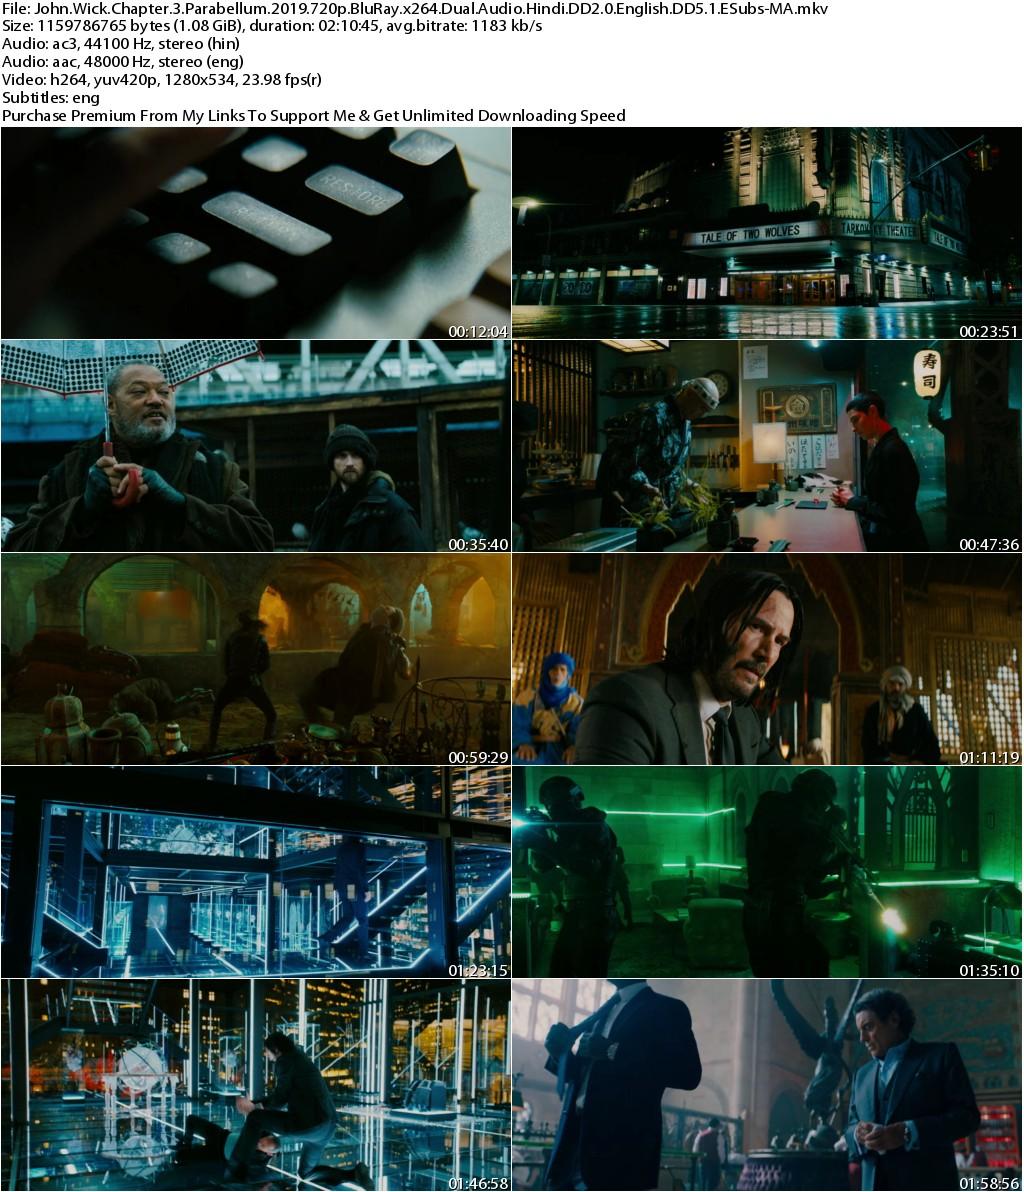 John Wick Chapter 3 Parabellum (2019) 720p BluRay x264 Dual Audio Hindi DD2.0 English DD5.1 ESubs-MA